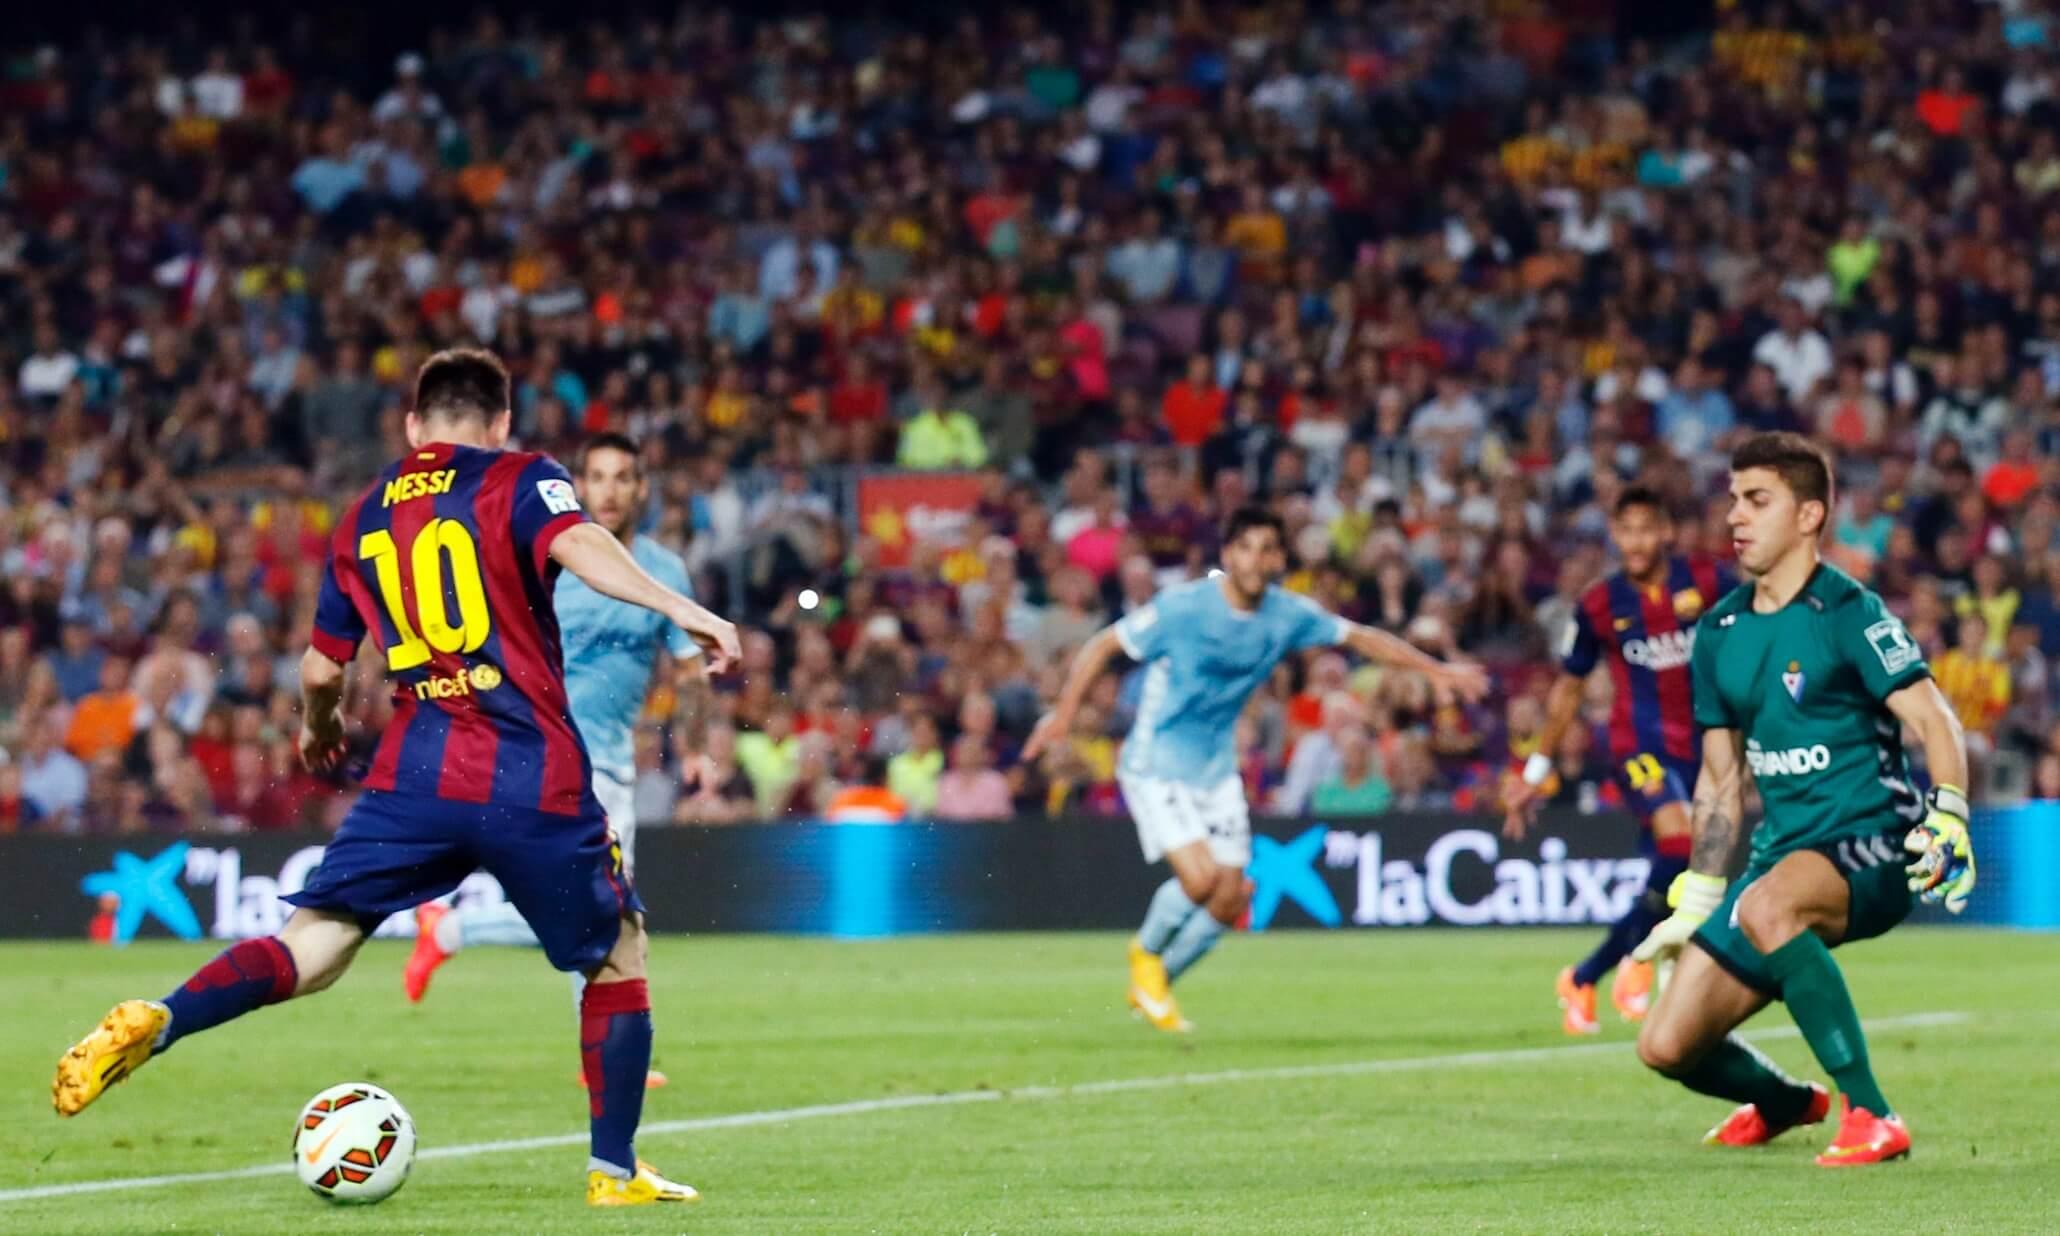 Eibar Vs Barcelona La Liga 2016-2017 IST Indian Time Live Stream and Telecast